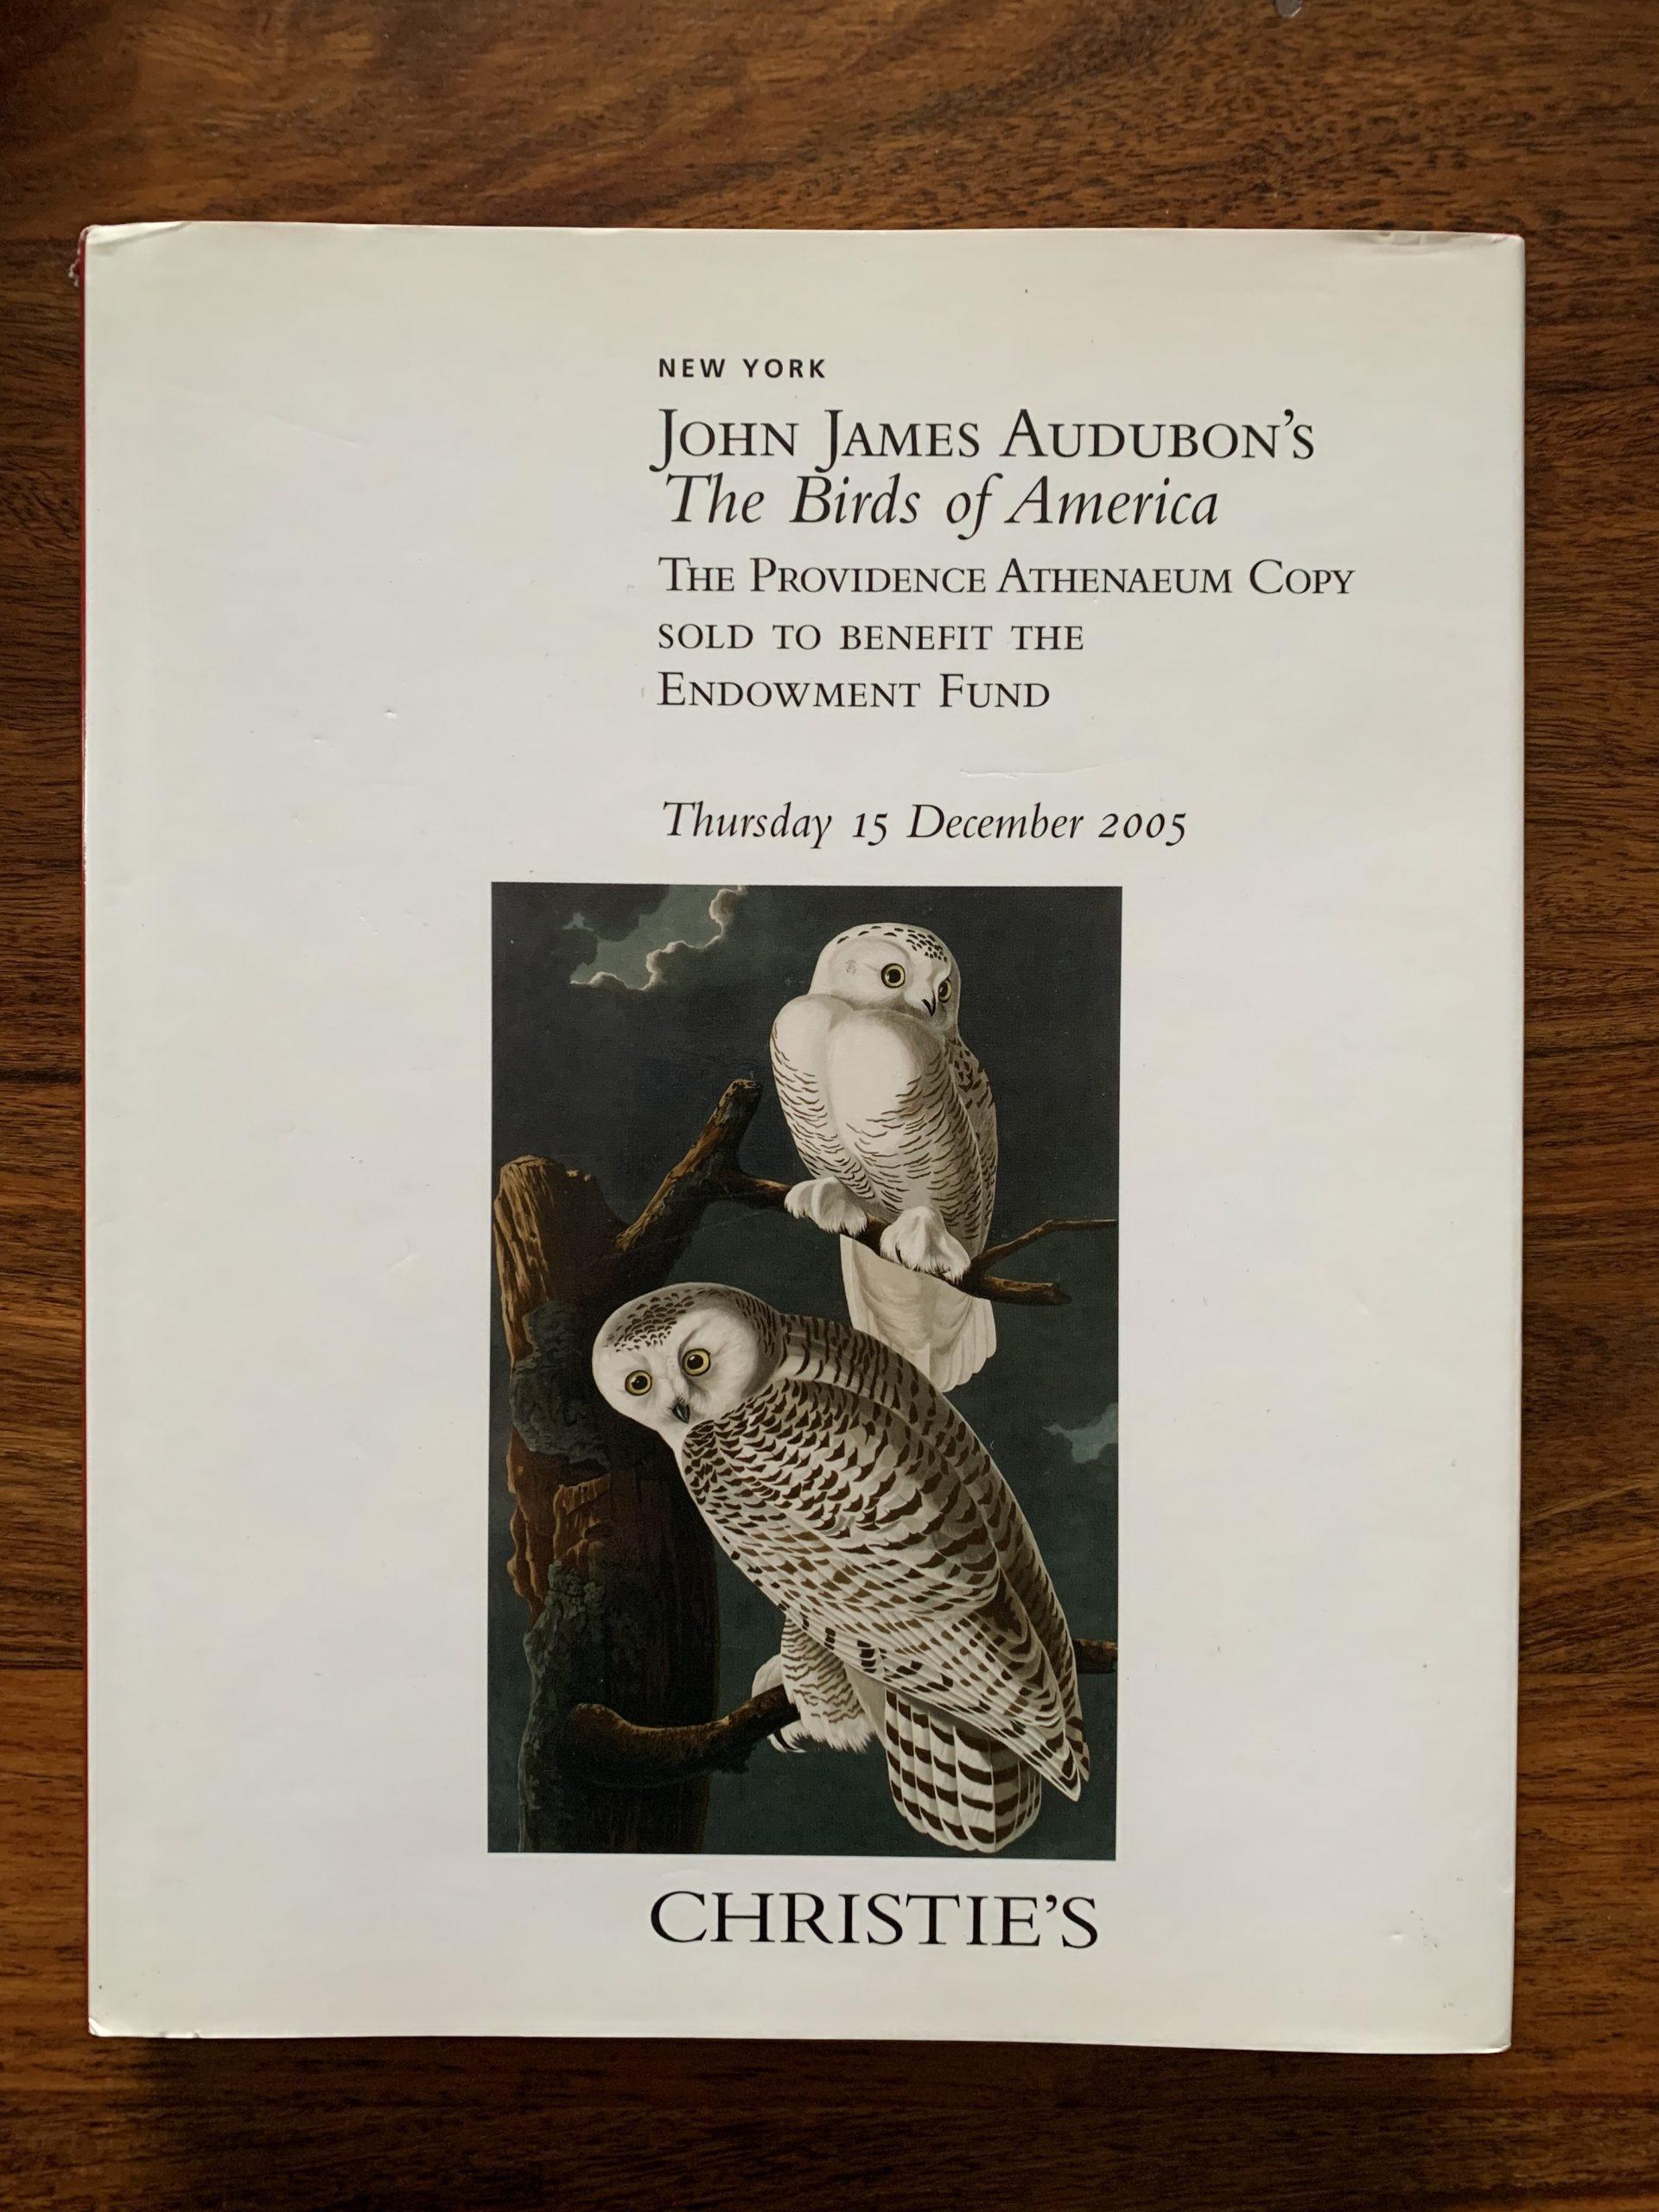 Christie's. John James Audubon's The Birds of America